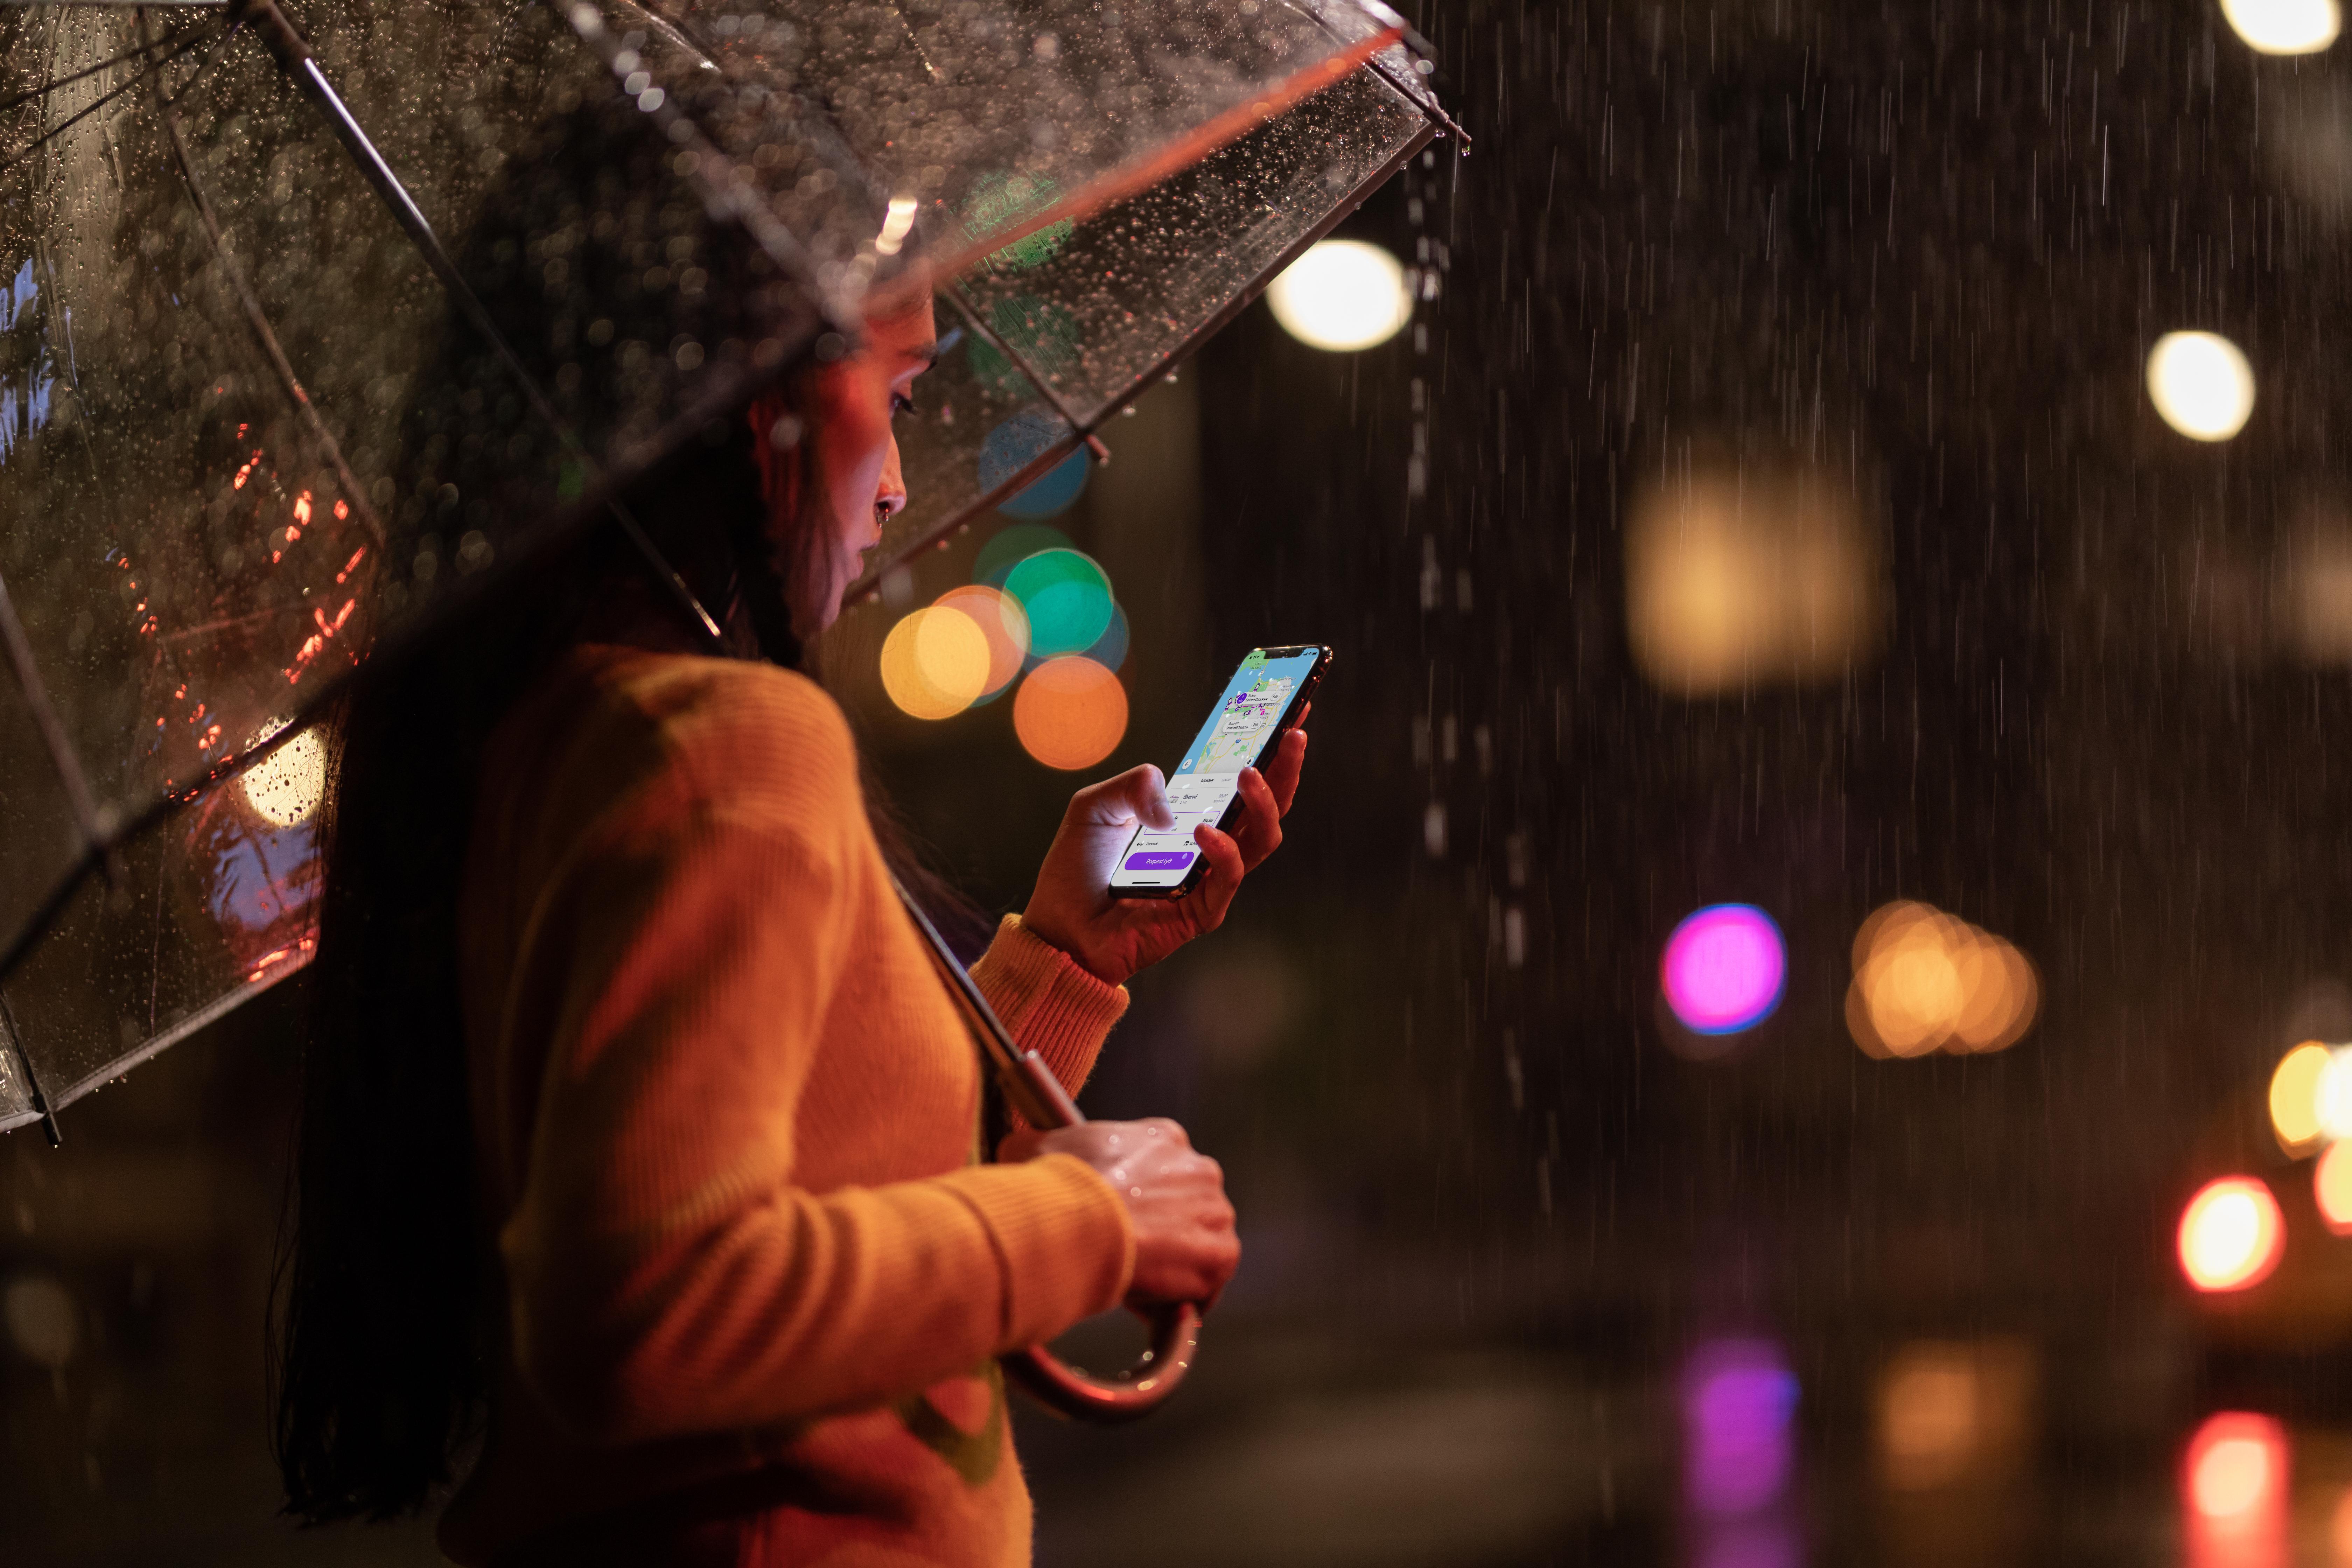 A person holding an iPhone while rain falls on their umbrella